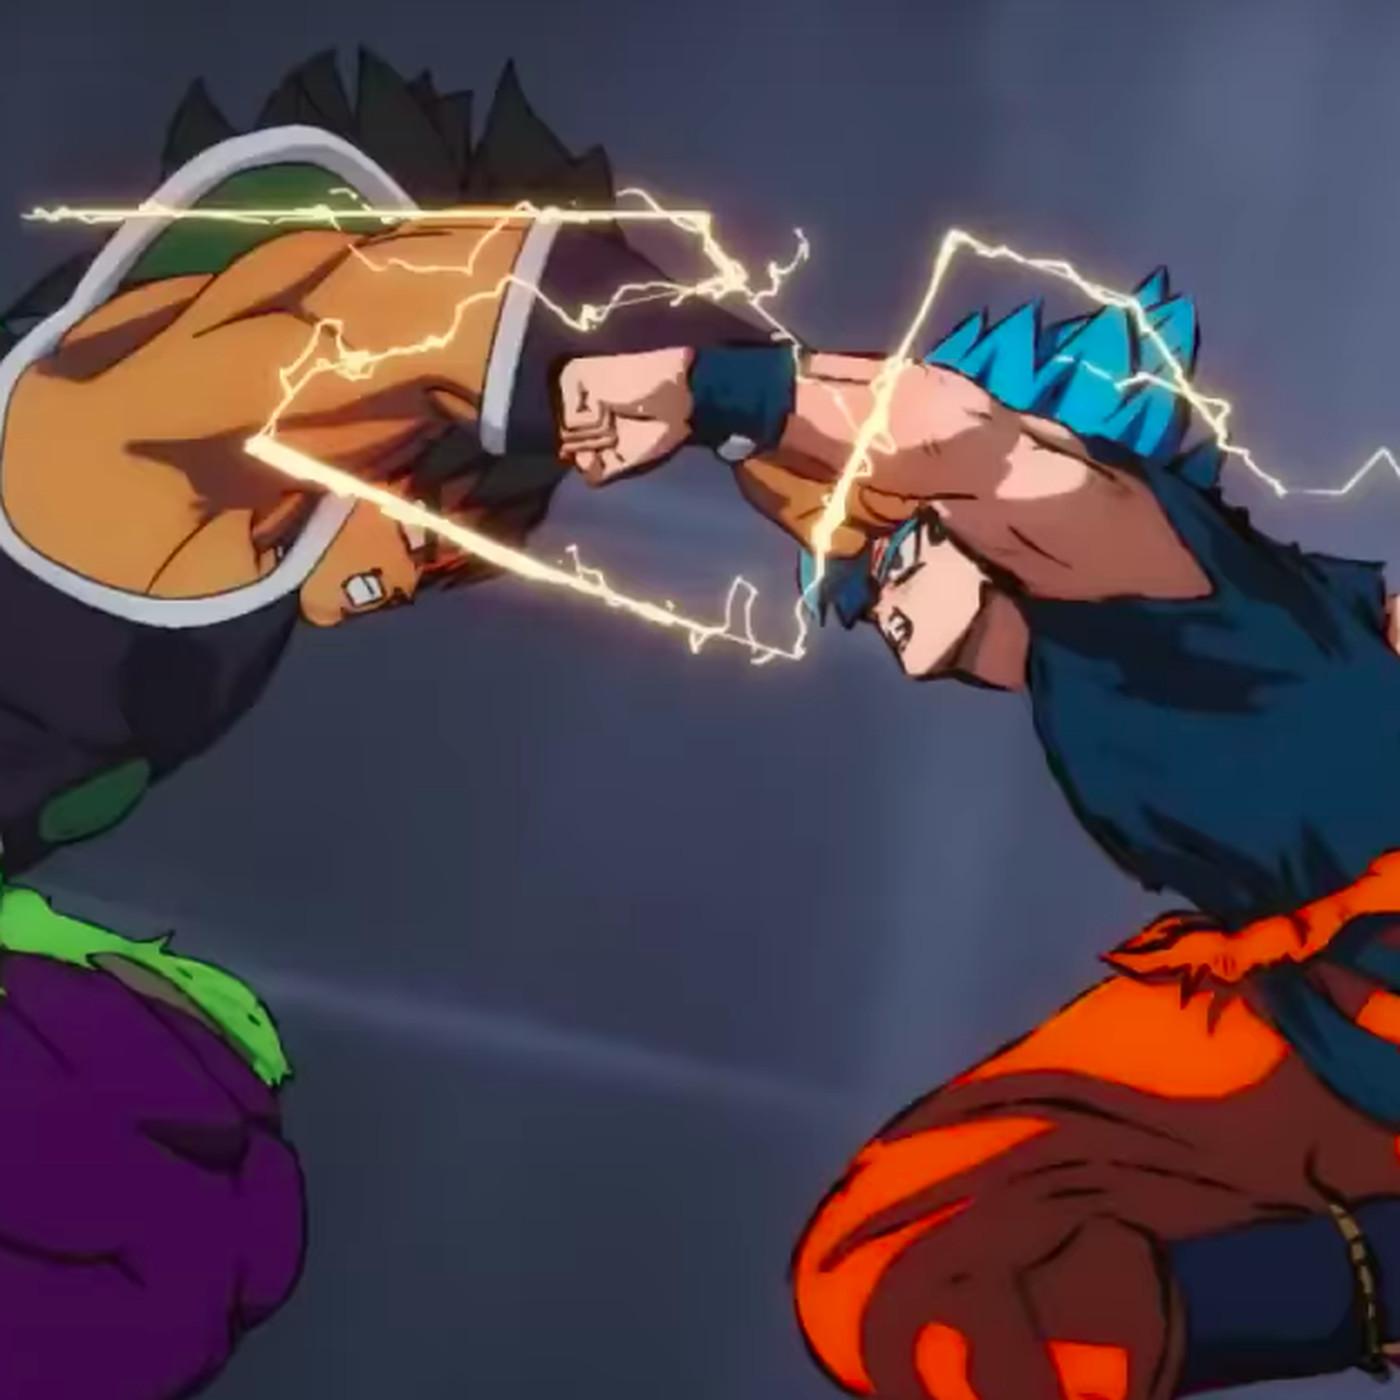 Dragon Ball Super Broly Sdcc 2018 Trailer Shows Legendary Saiyan